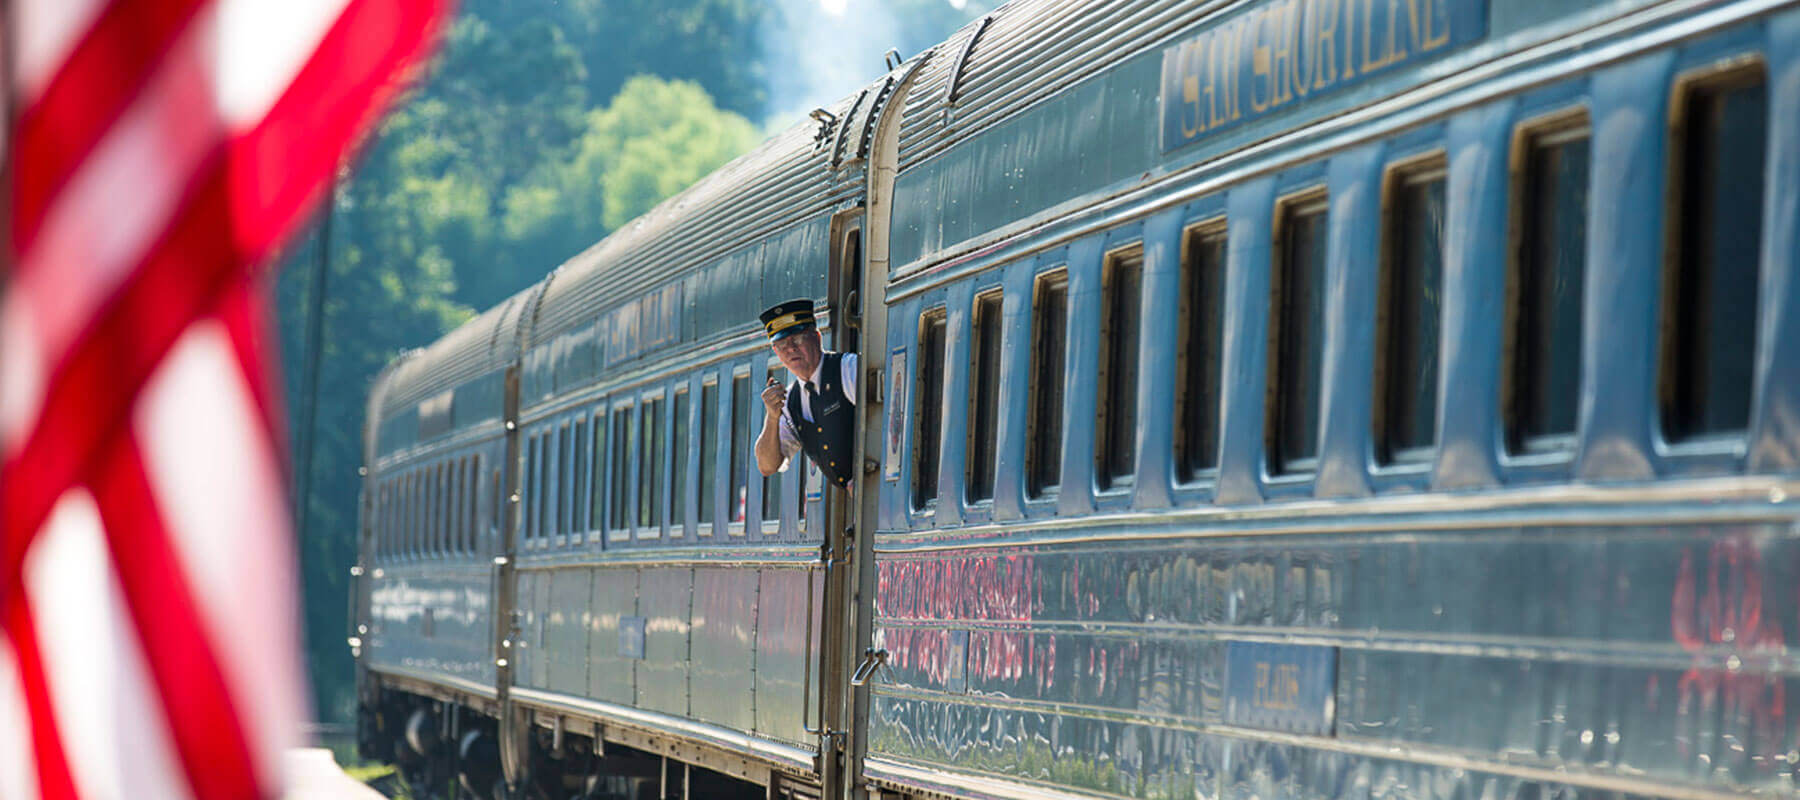 Lake-Blackshear-Georgia-Train-Excursions-GA-Veterans-Park-SAM-Shortline-Train-Slider-5-georgia-train-rides